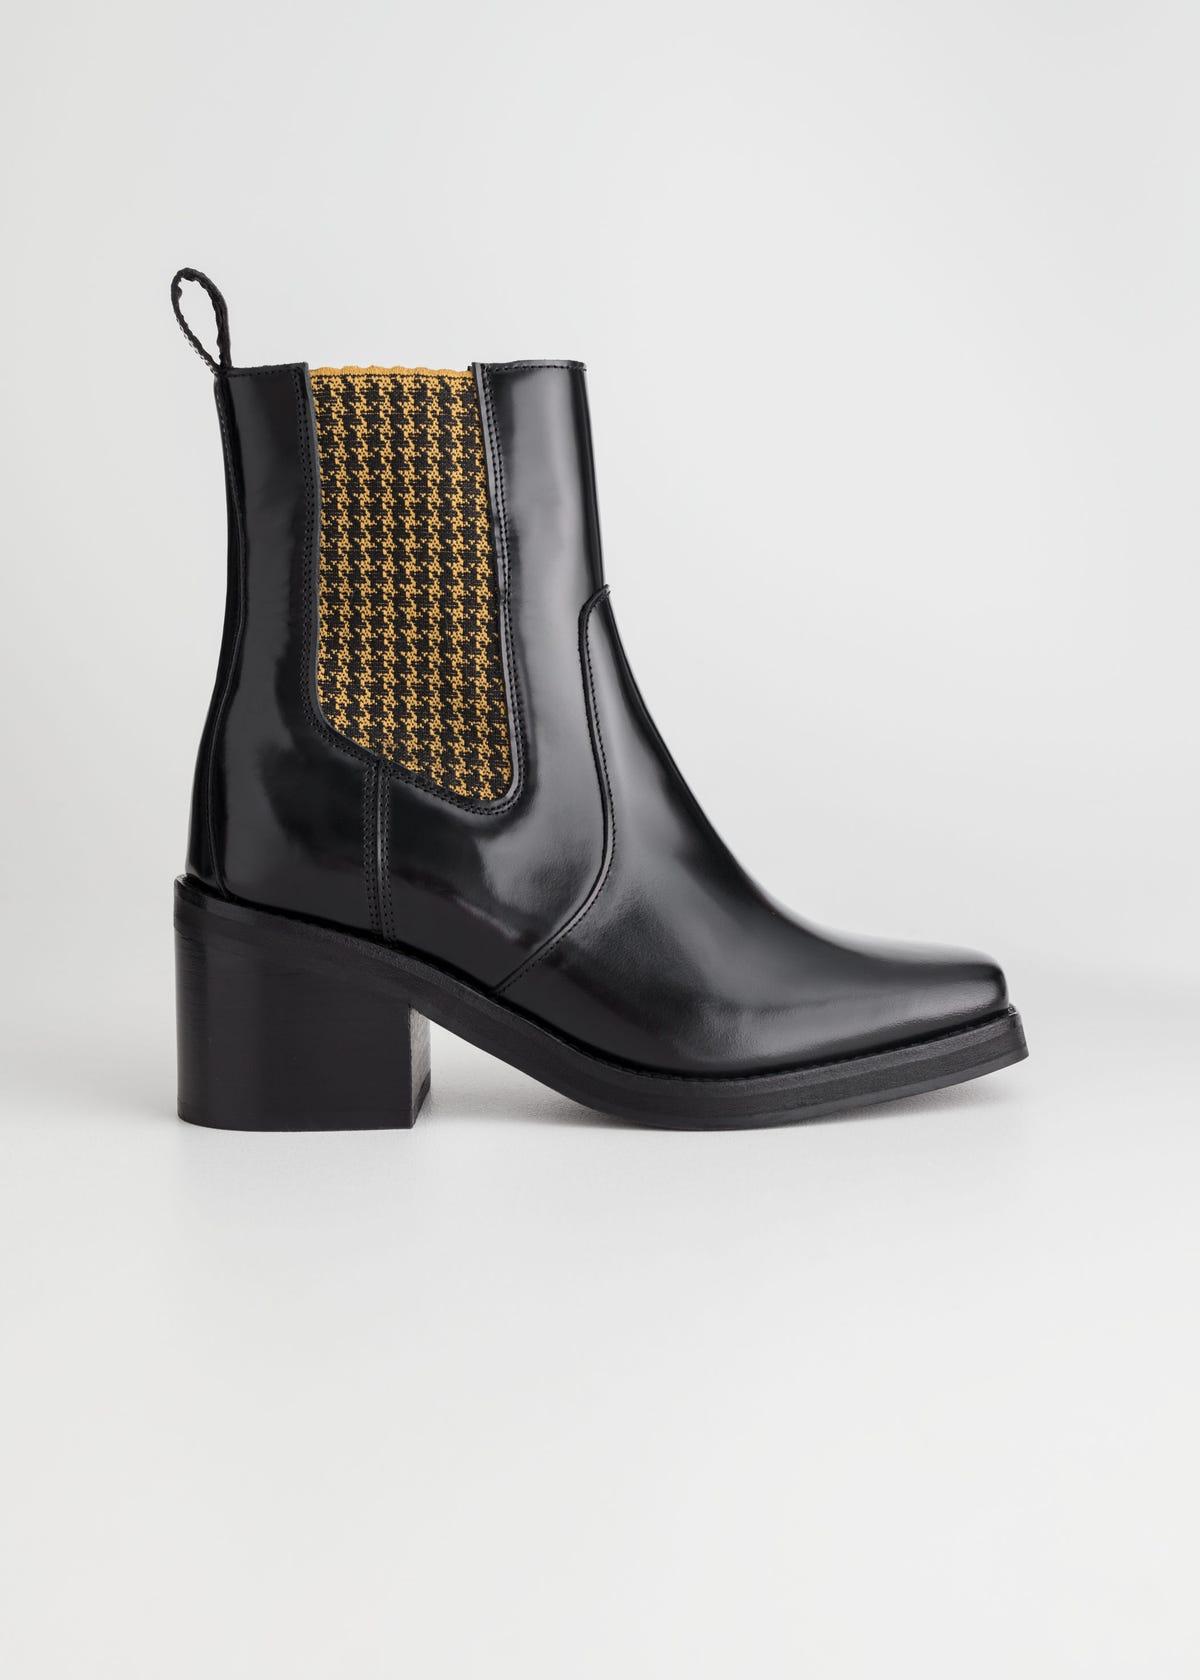 75f89b27bd8 Womens Boots Trends - Best Winter 2019 Boot Styles